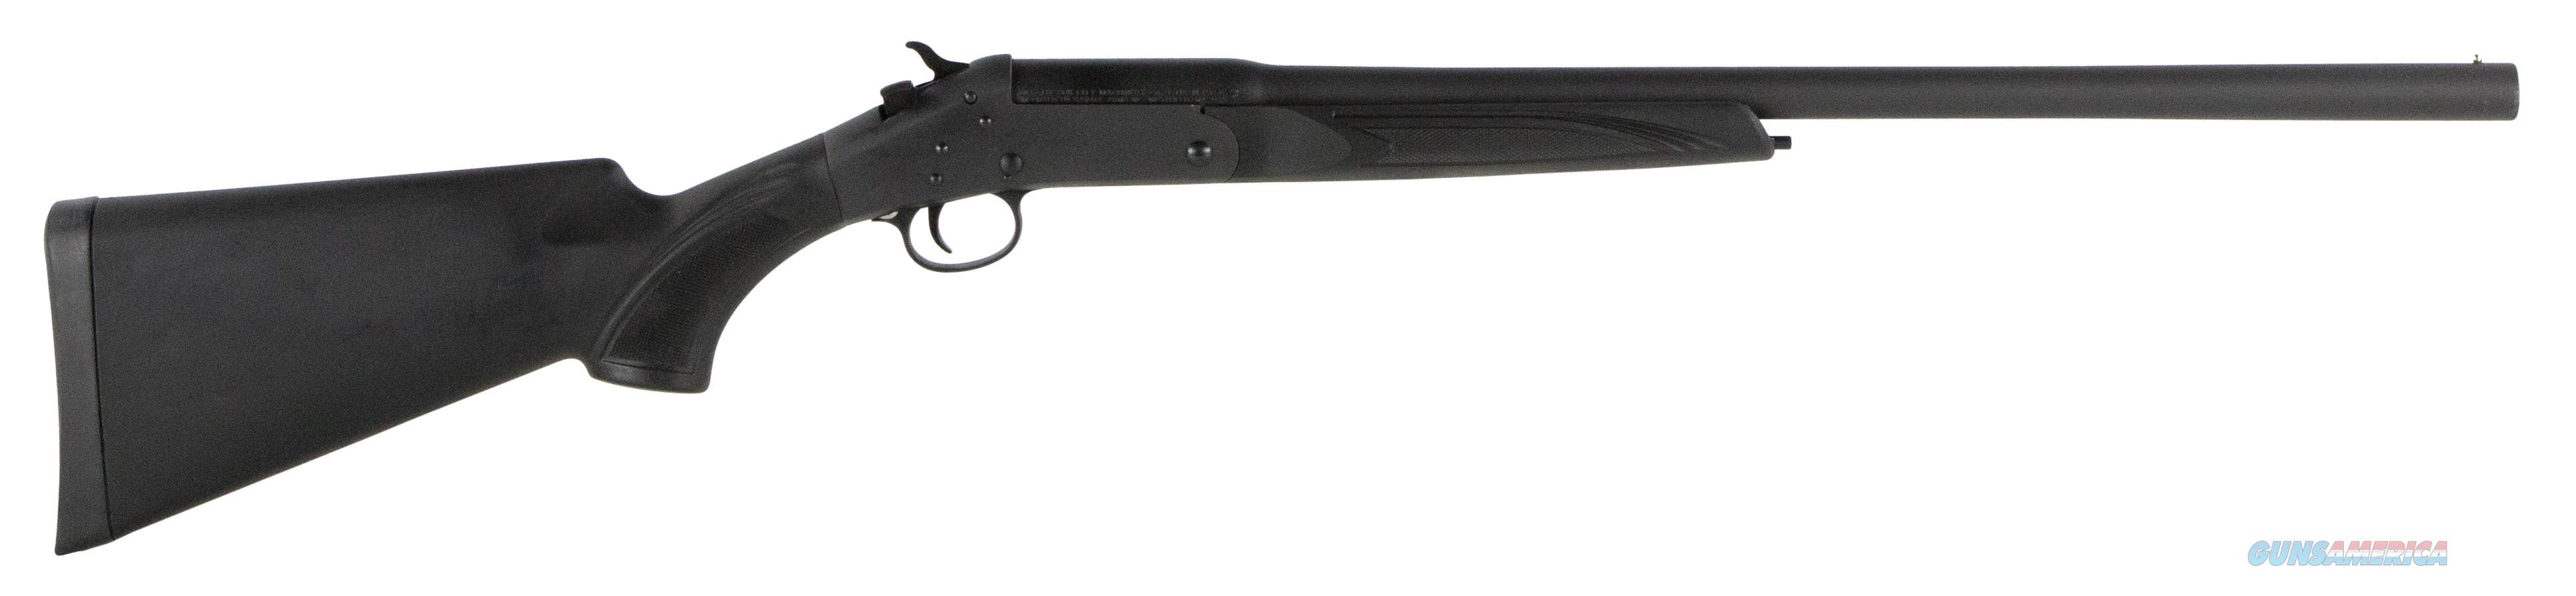 "Savage Stevens 301 Compact Single Shot 20 Gauge 22"" 22559   Guns > Shotguns > Stevens Shotguns"